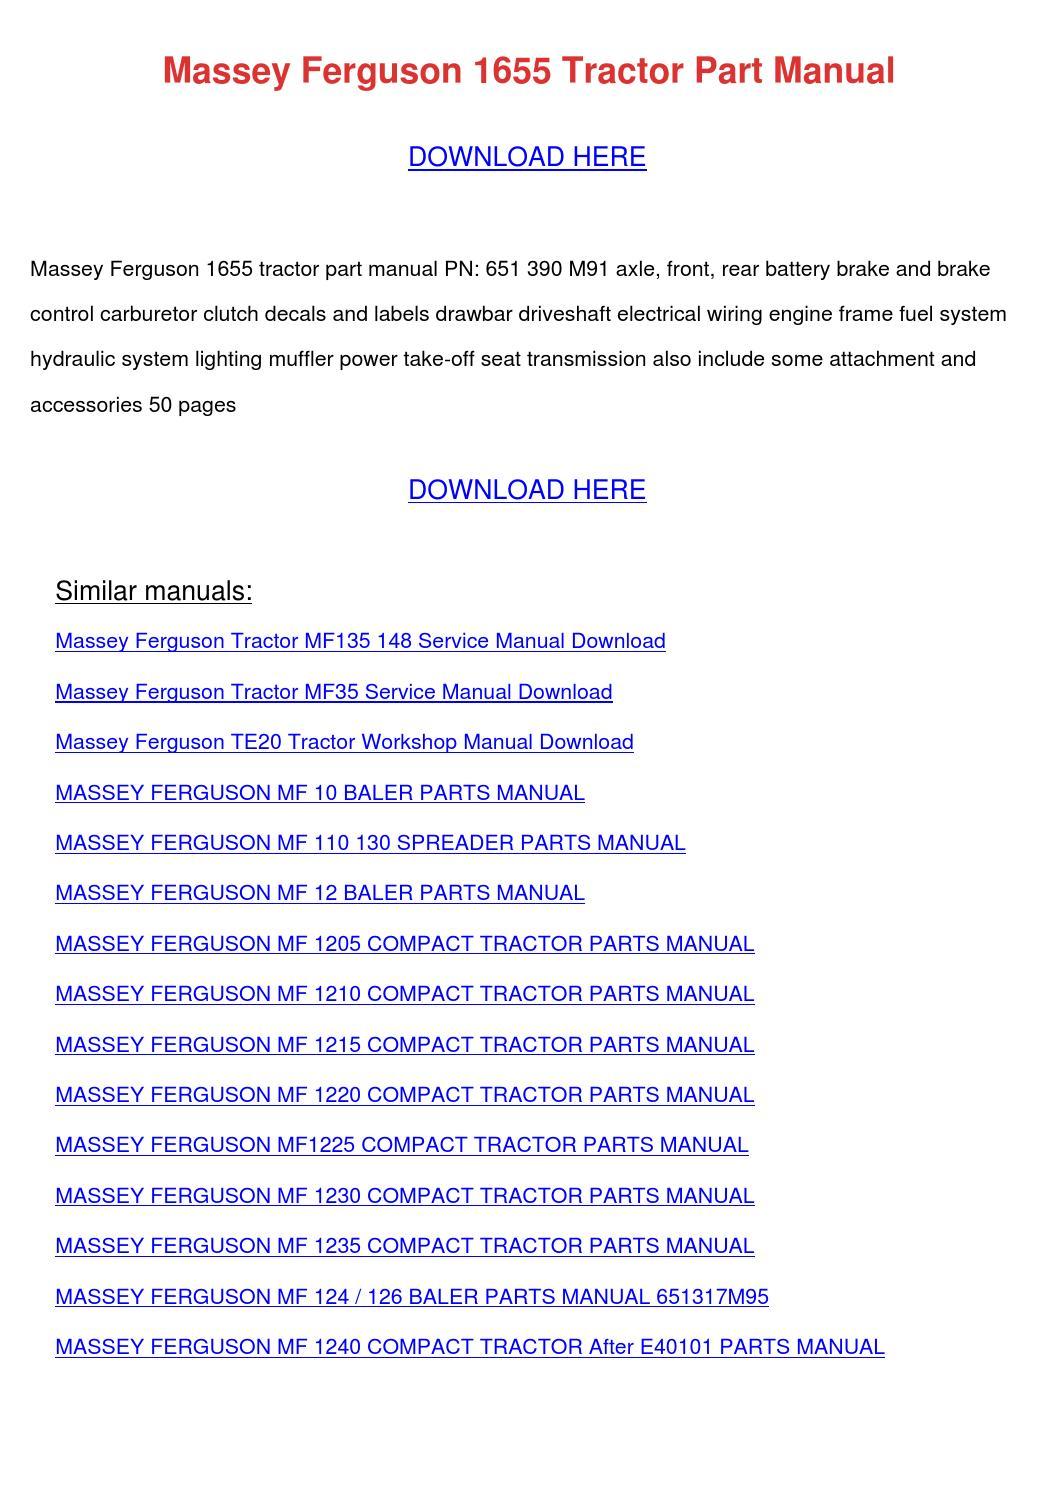 Massey Ferguson 1655 Tractor Part Manual by LakeshaKessler - issuu